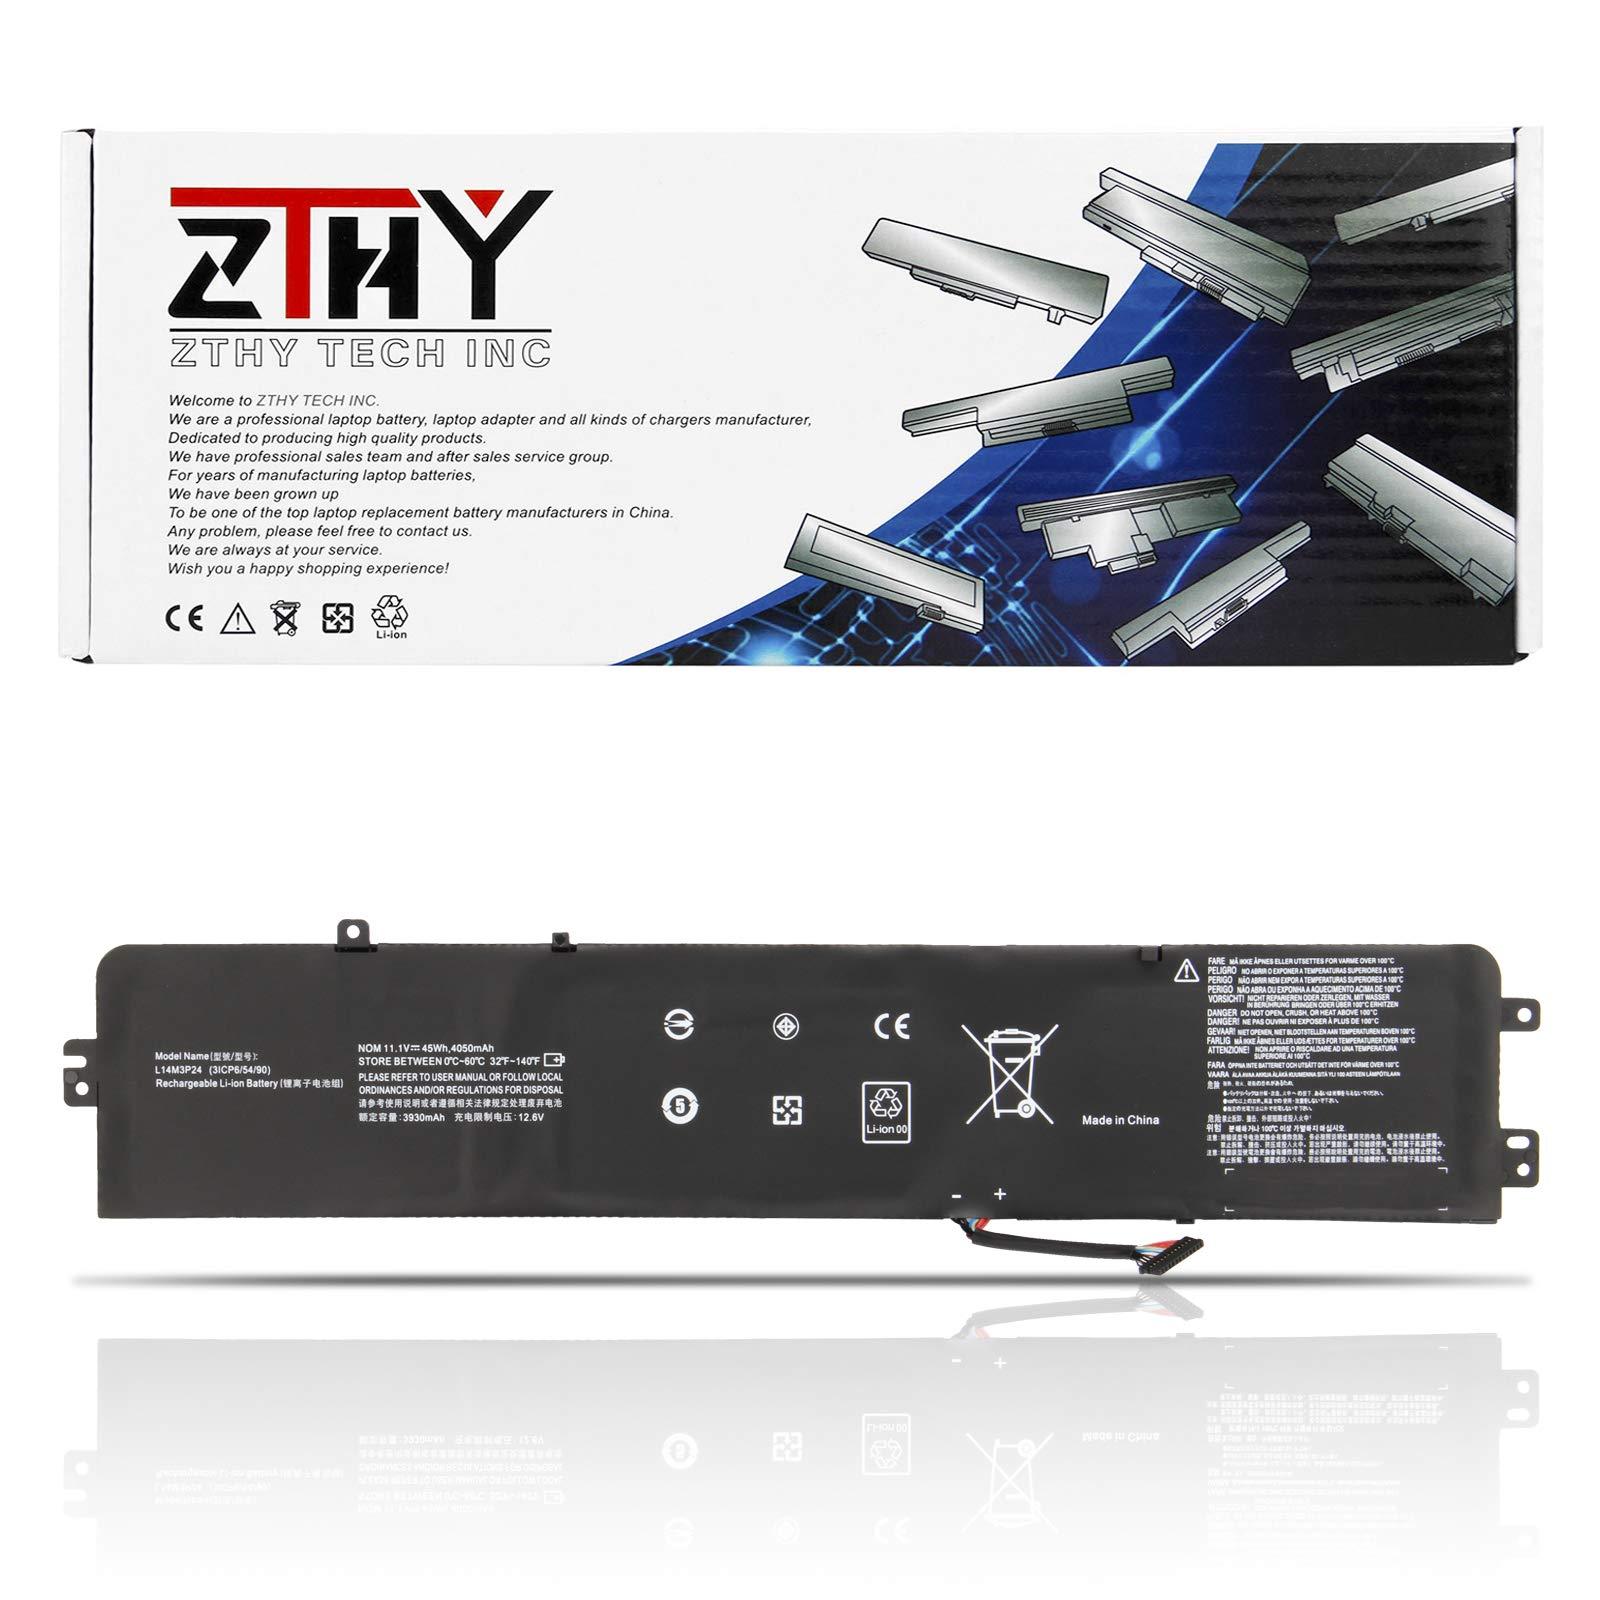 ZTHY New L14M3P24 Battery Replacement for Legion Y520-15IKBA Y520-15IKBM Y520-15IKBN IdeaPad Xiaoxin 700 700-15ISK 700-17ISK Y700-14ISK R720-15IKB Series L14S3P24 L16S3P24 L16M3P24